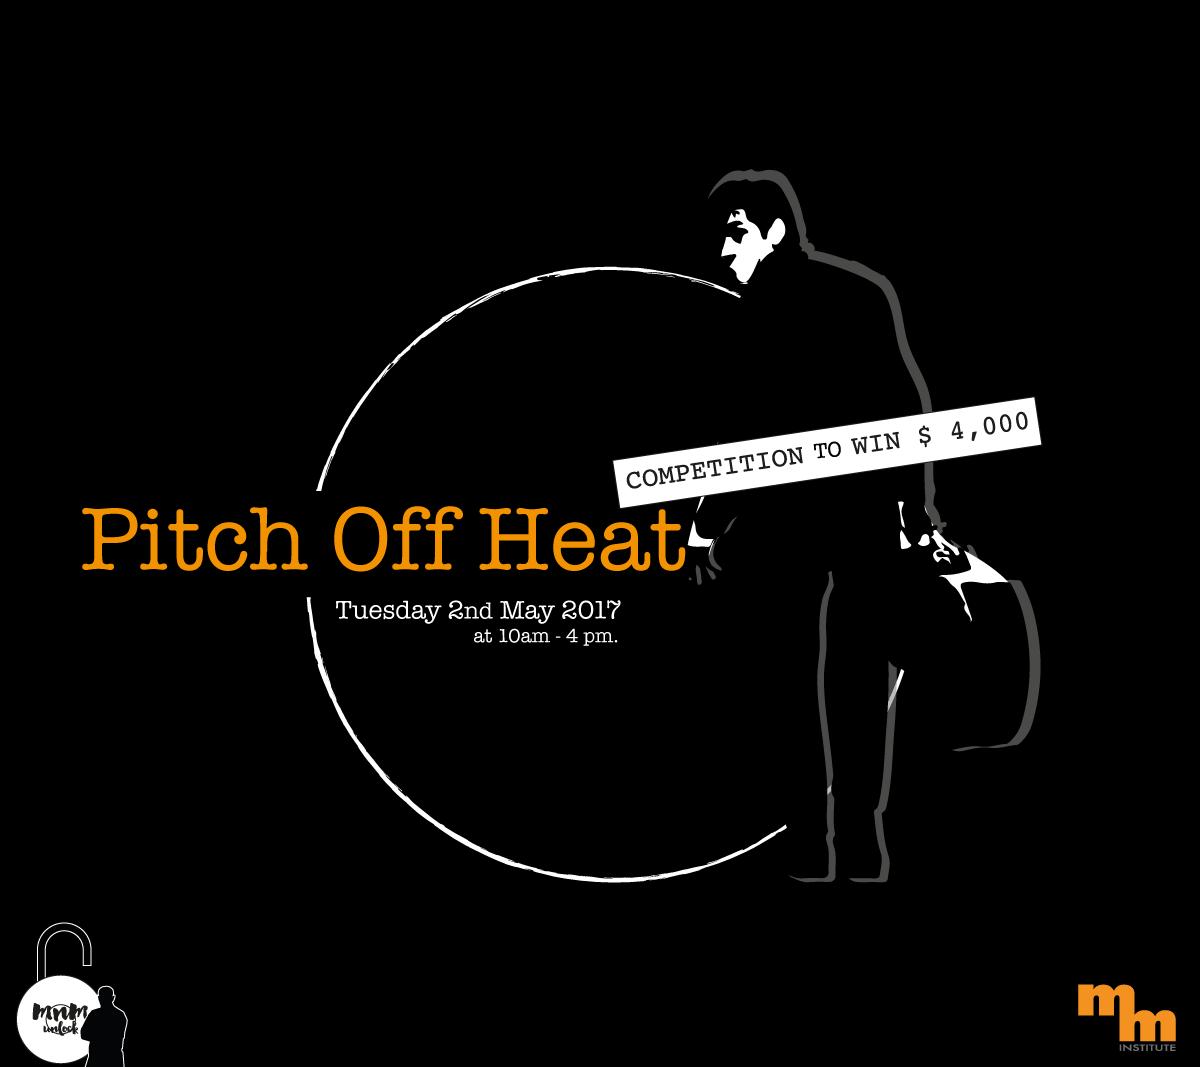 pitch-off-heat_website03